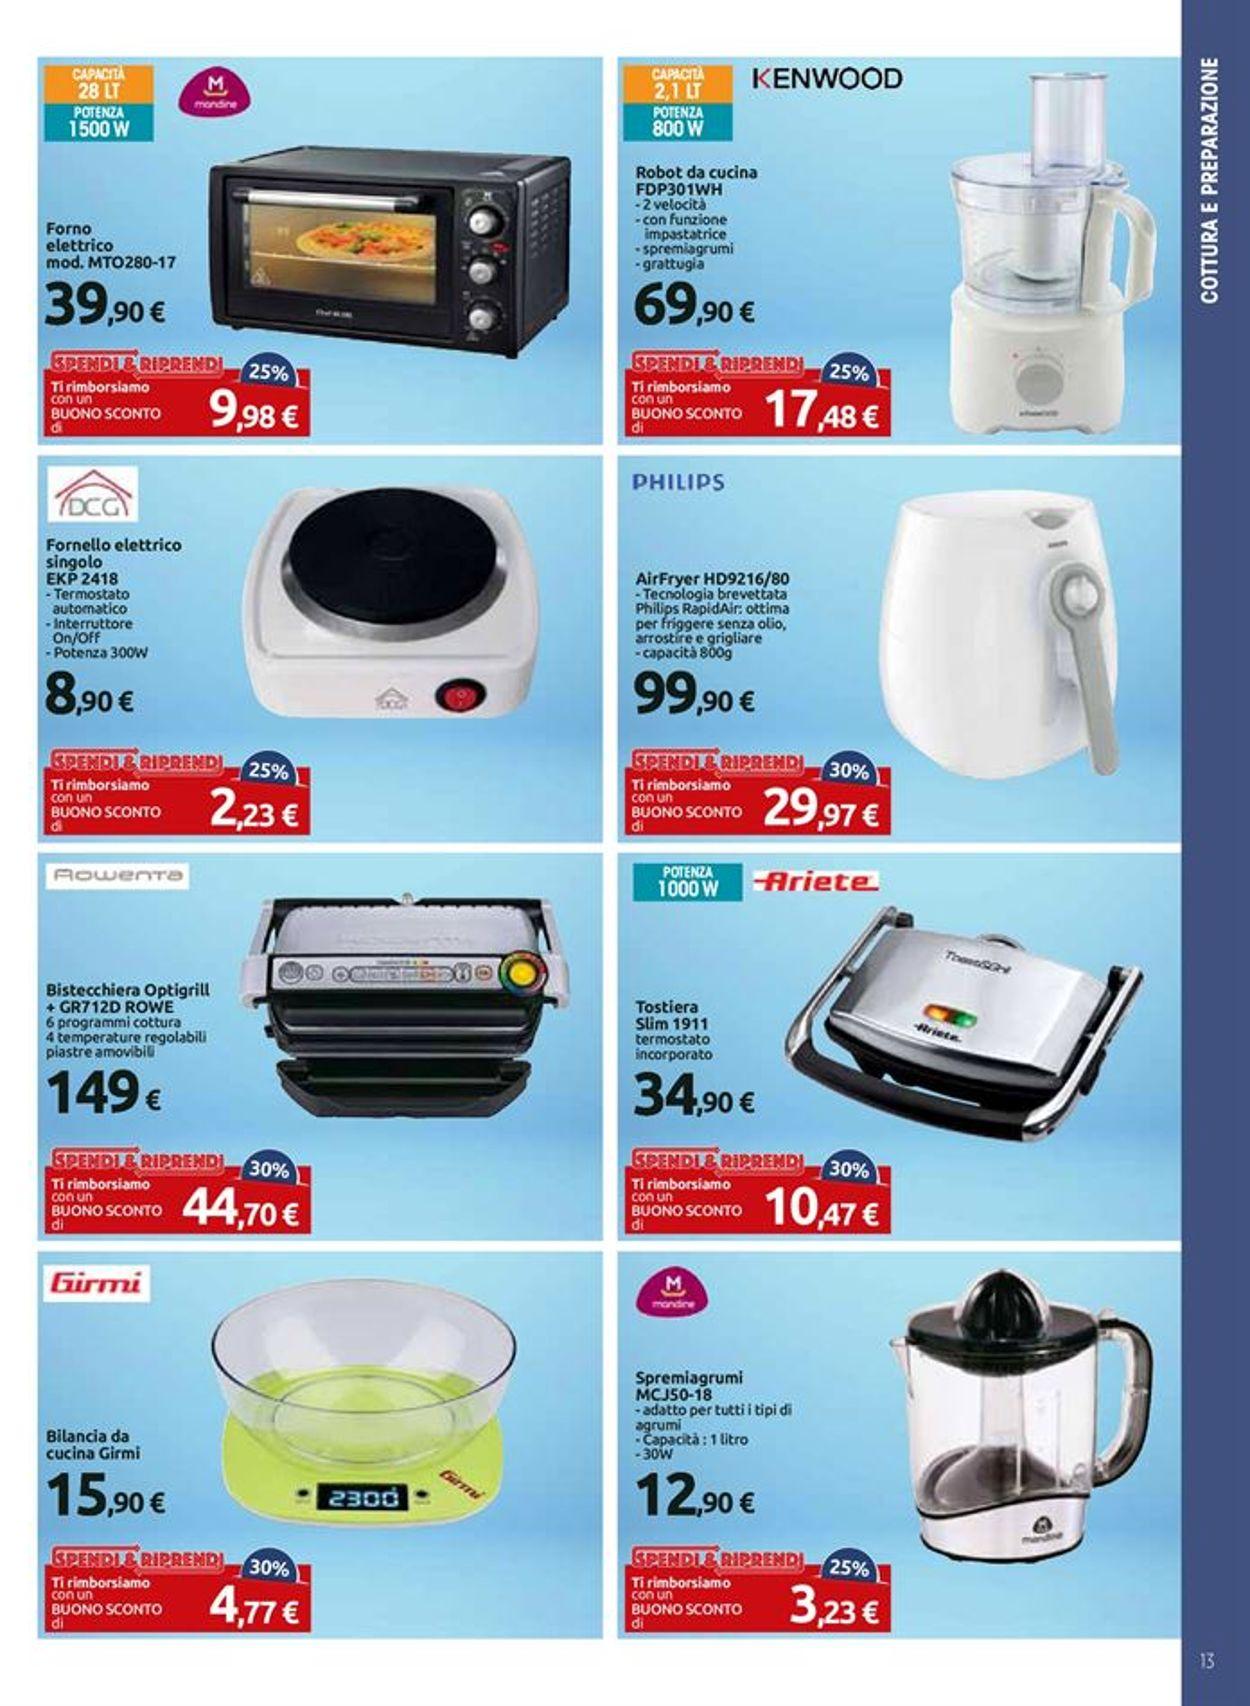 Volantino Carrefour - Offerte 30/01-09/02/2020 (Pagina 13)